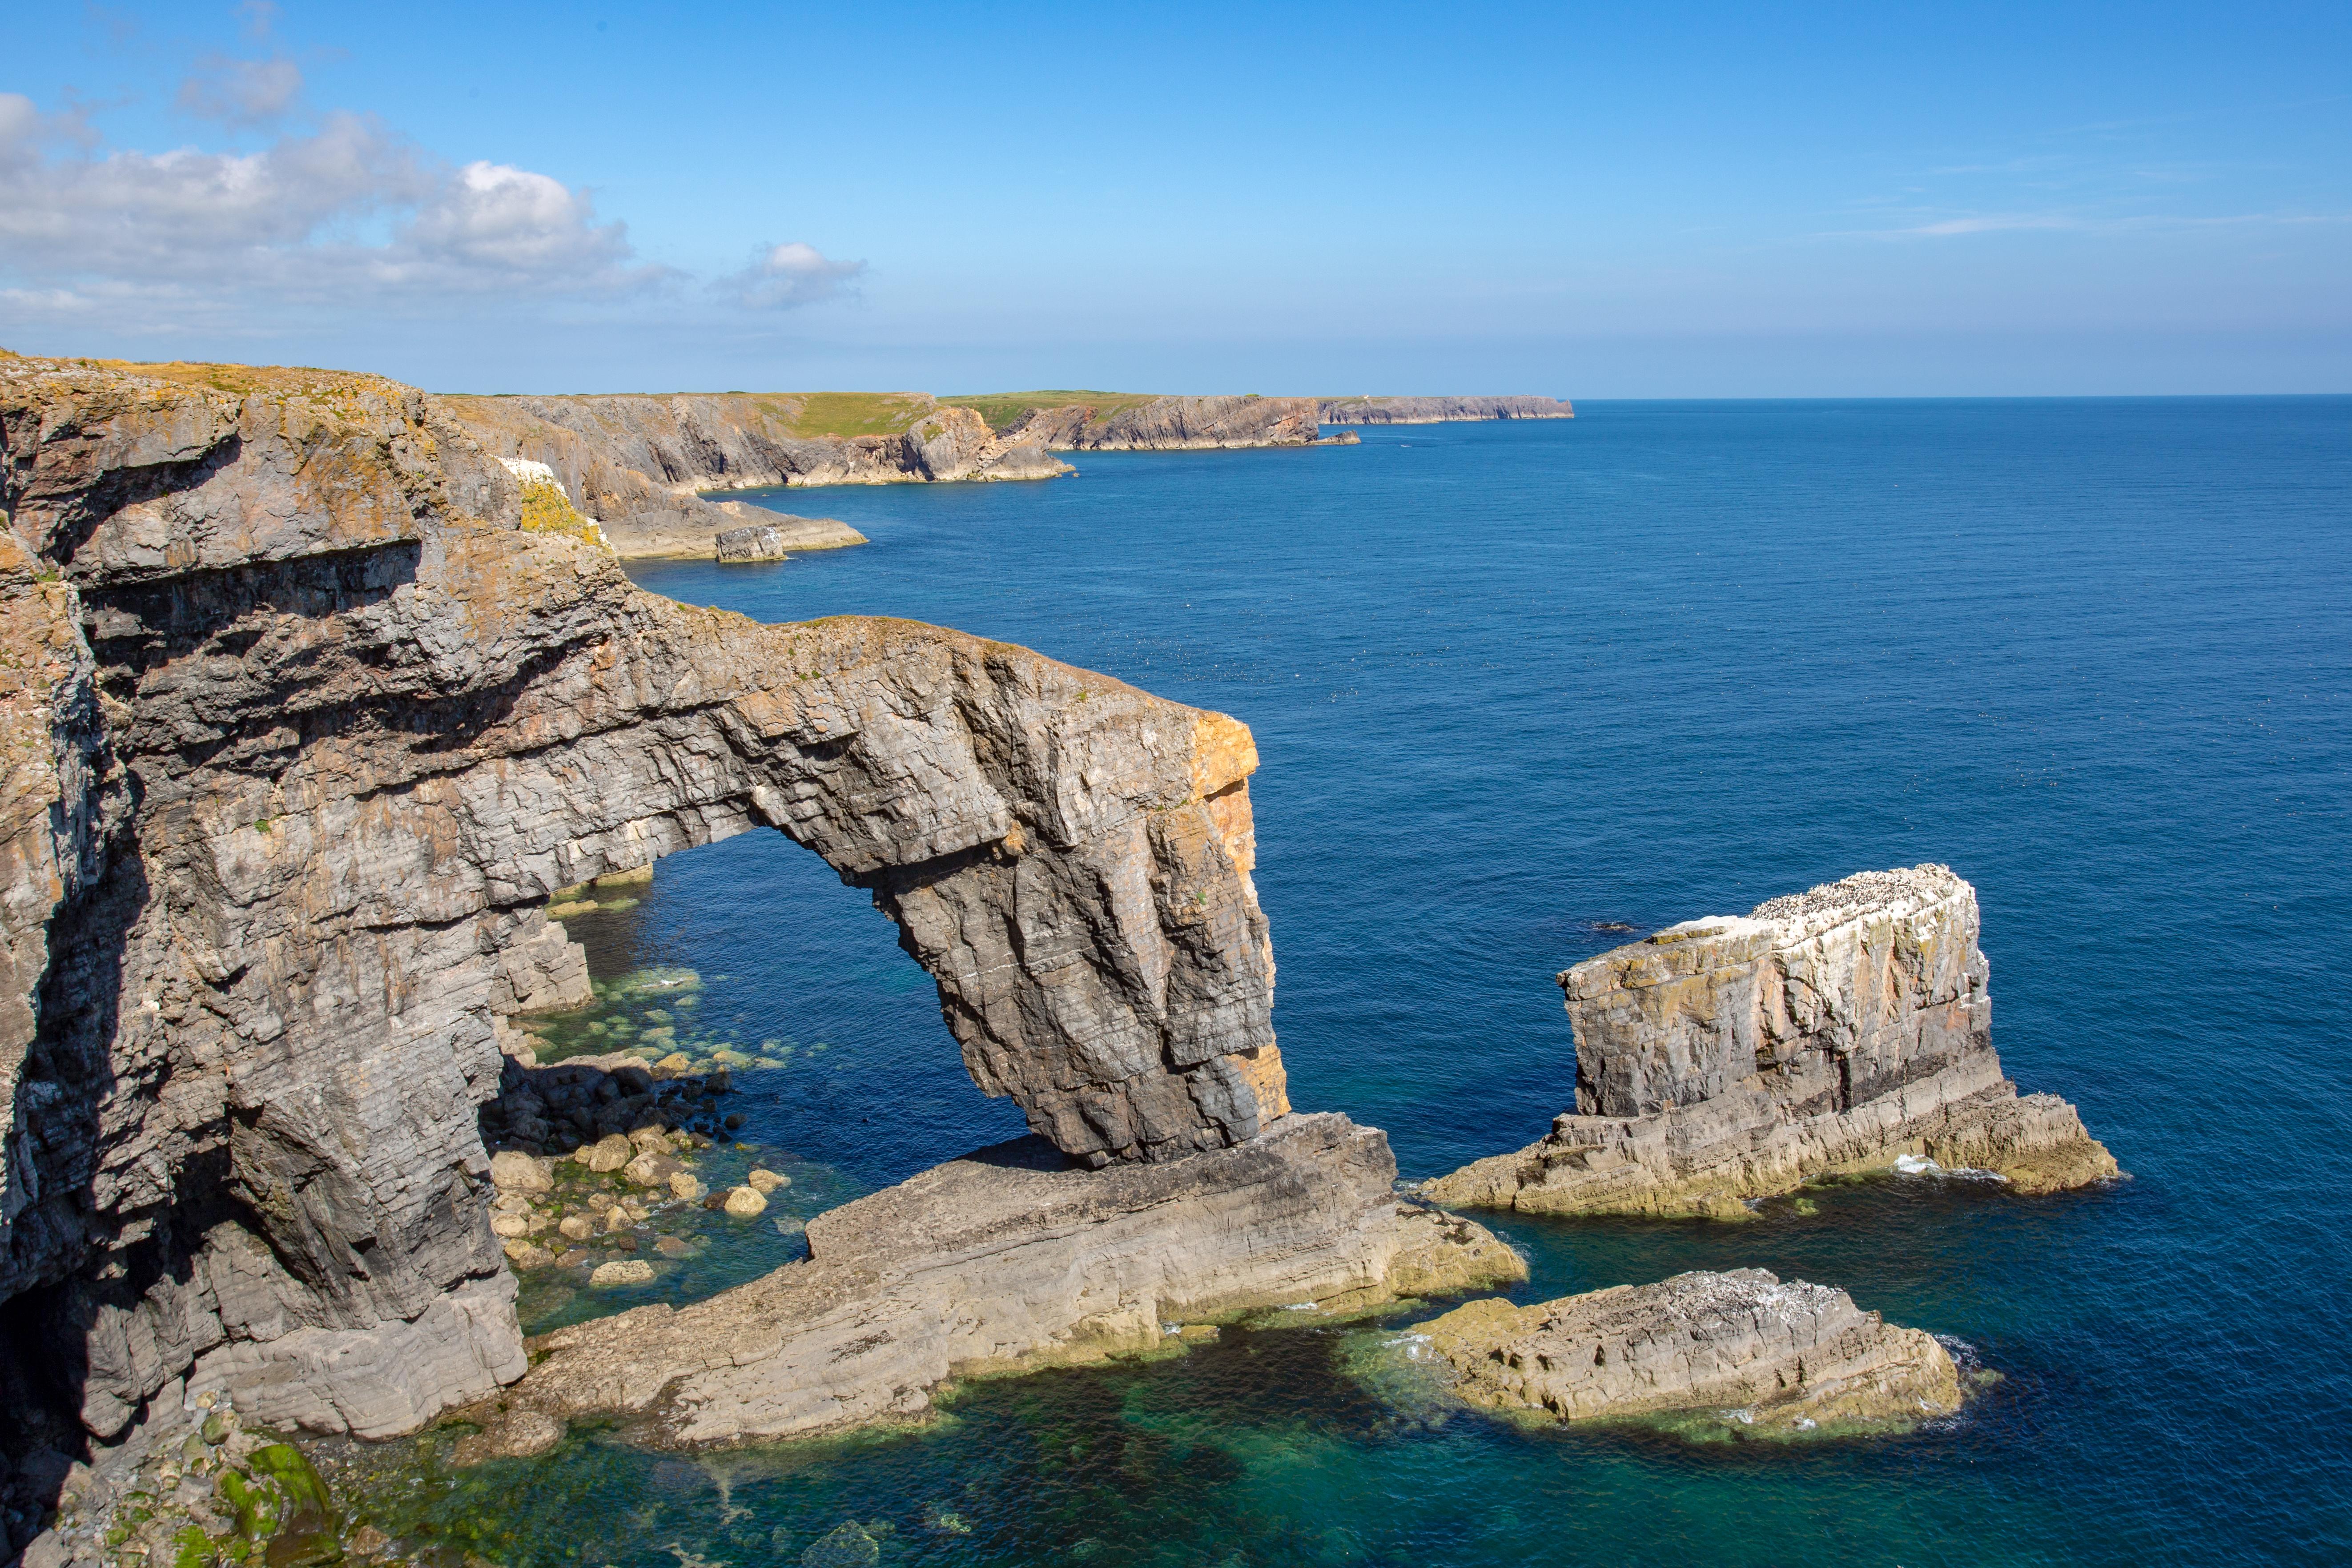 Limestone sea rach known as the Green Bridge of Wales at Castlemartin Firing Range,